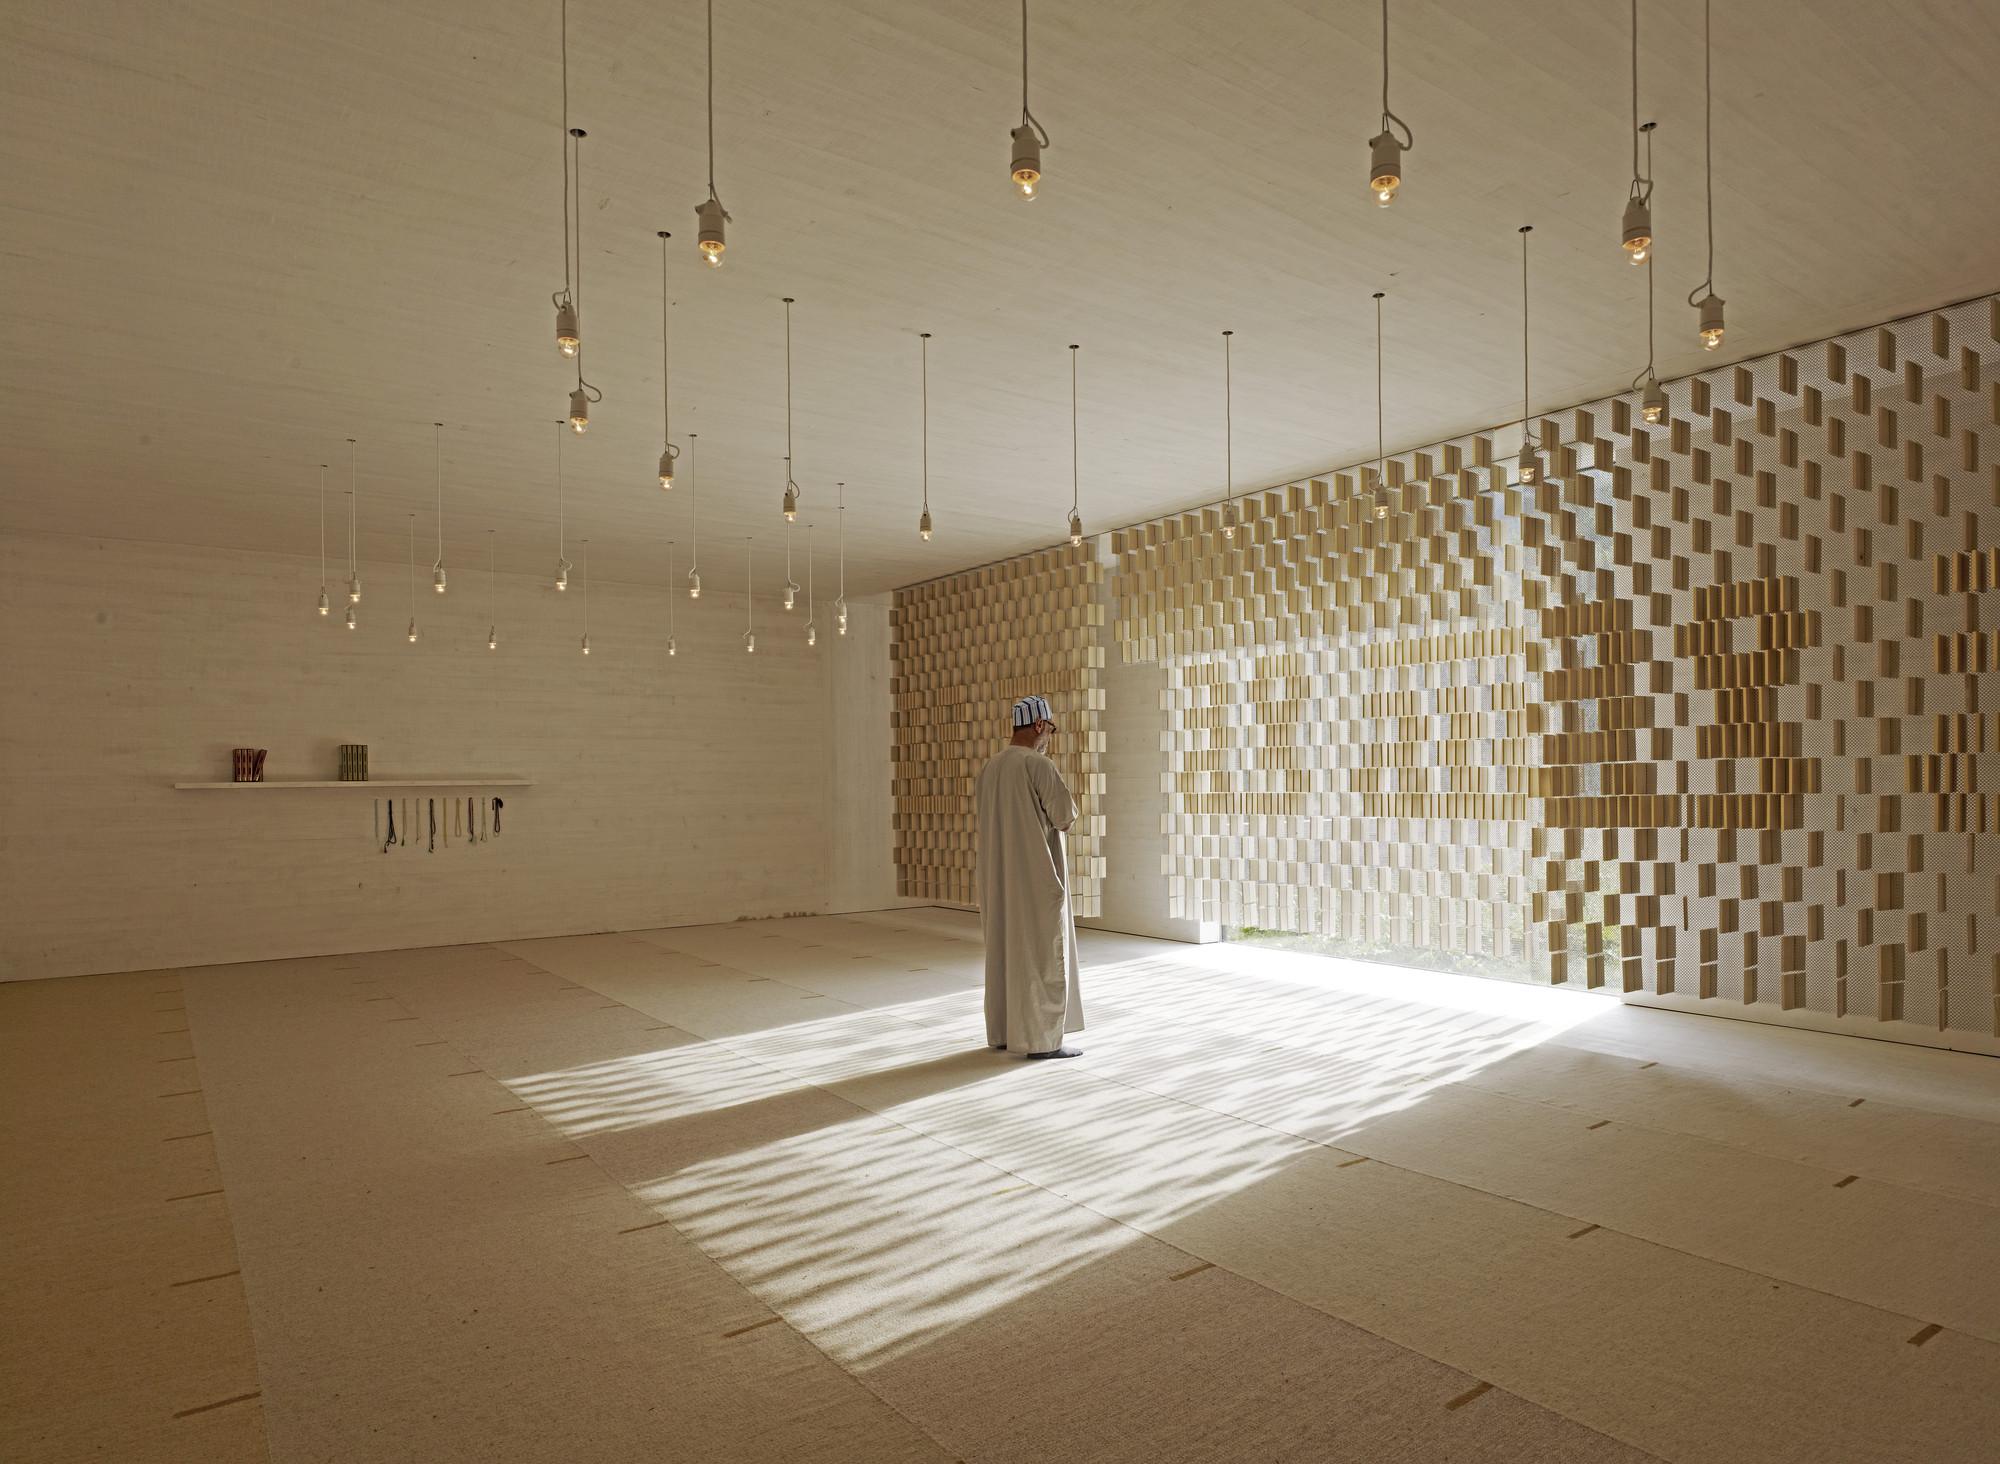 Islamic Cemetery, Altach, Austria / Bernado Bader Architects. Image © AKAA / Marc Lins